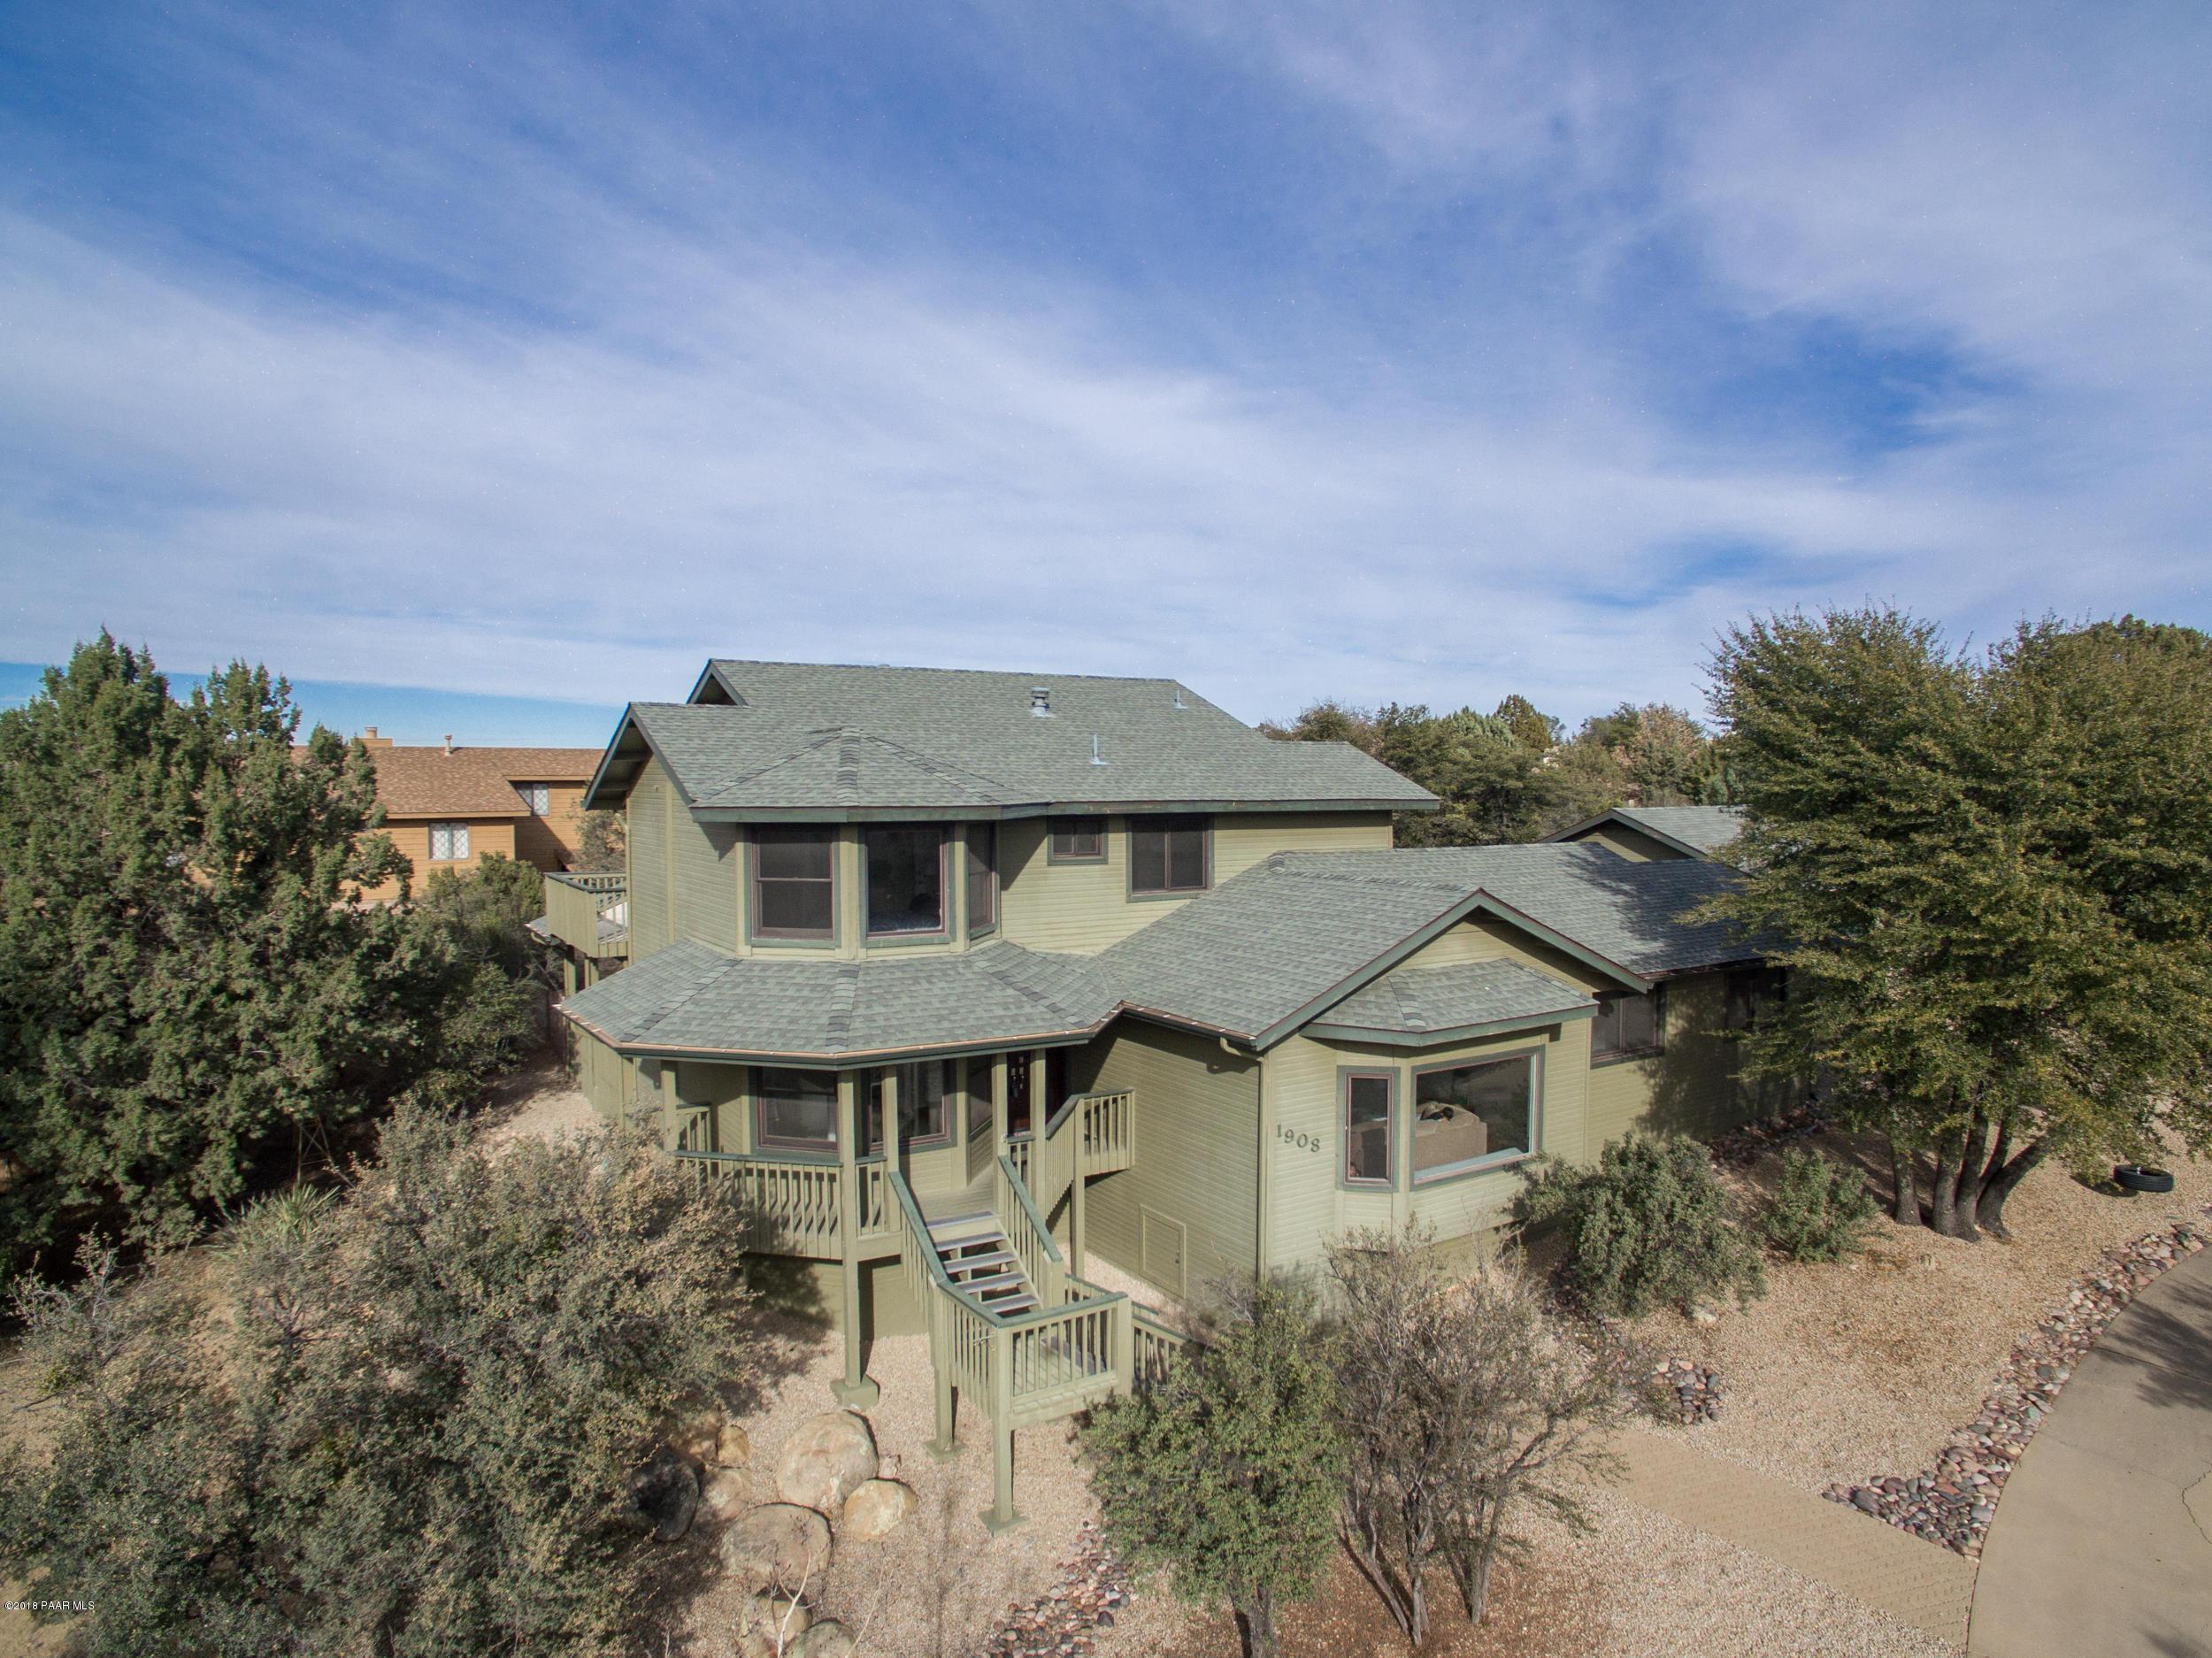 Photo of 1908 Woods, Prescott, AZ 86305